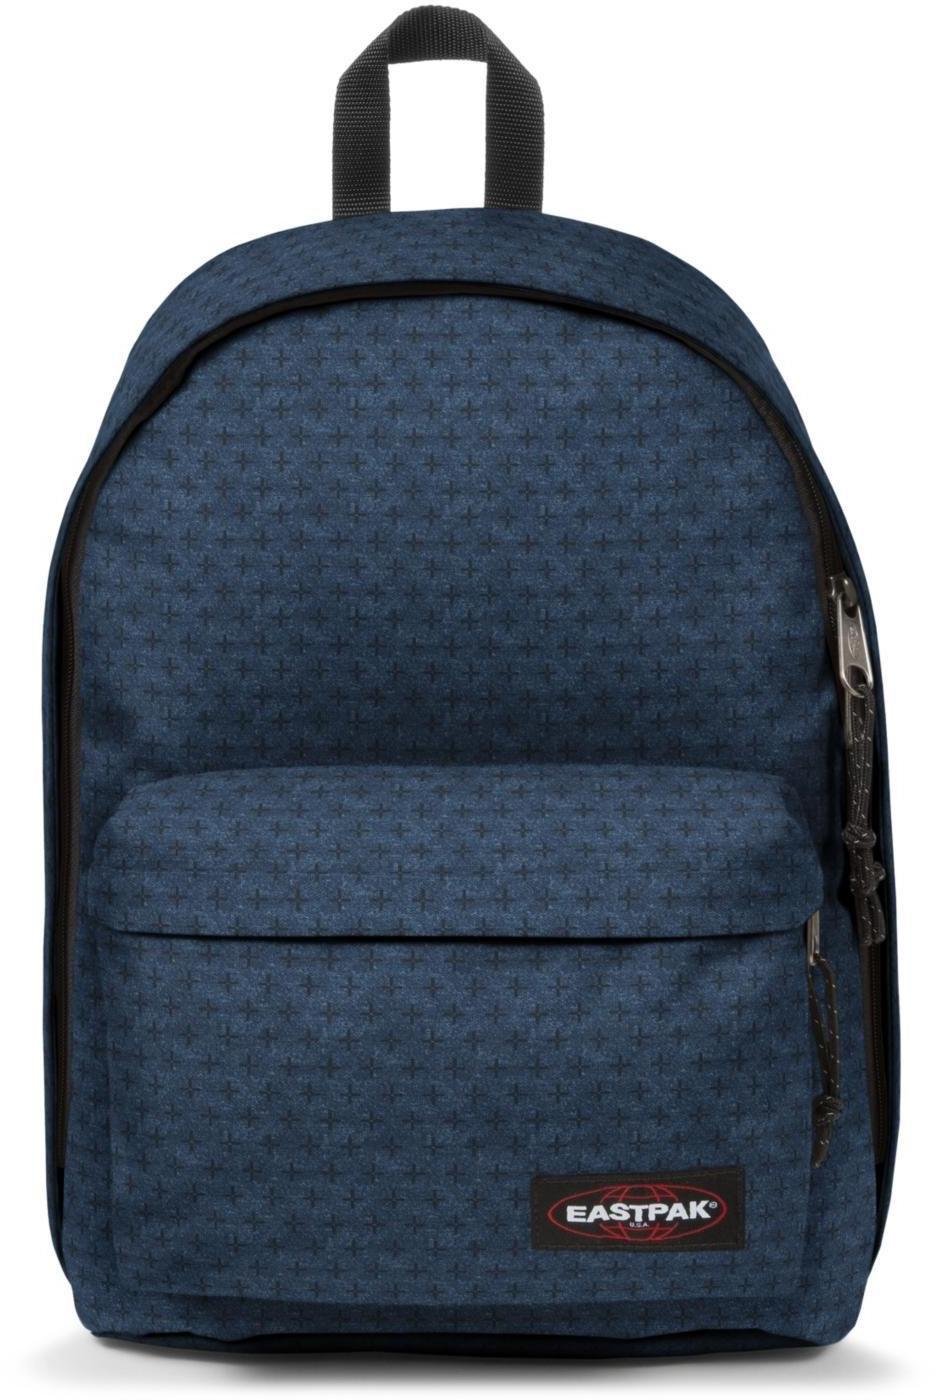 fd427e19a88 ... Undercover rugzak met vak voor tablet, »Unkeeper New York Baseball,  Adventure Backpack«, Eastpak rugzak, »PADDED PAK'R sunday grey«, adidas  sportrugzak, ...